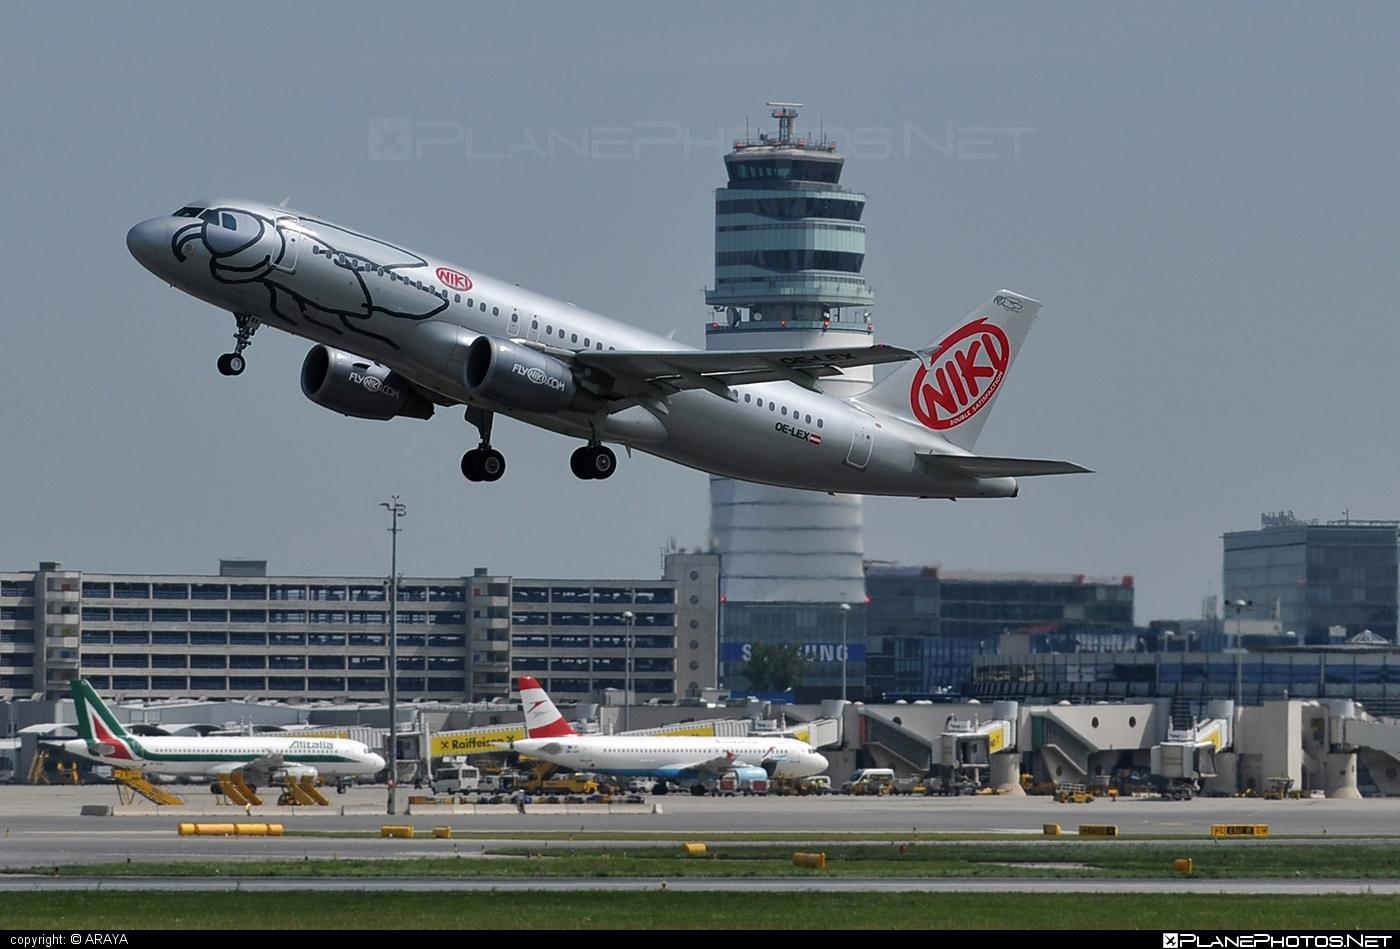 Airbus A320-214 - OE-LEX operated by Niki #a320 #a320family #airbus #airbus320 #flyniki #niki